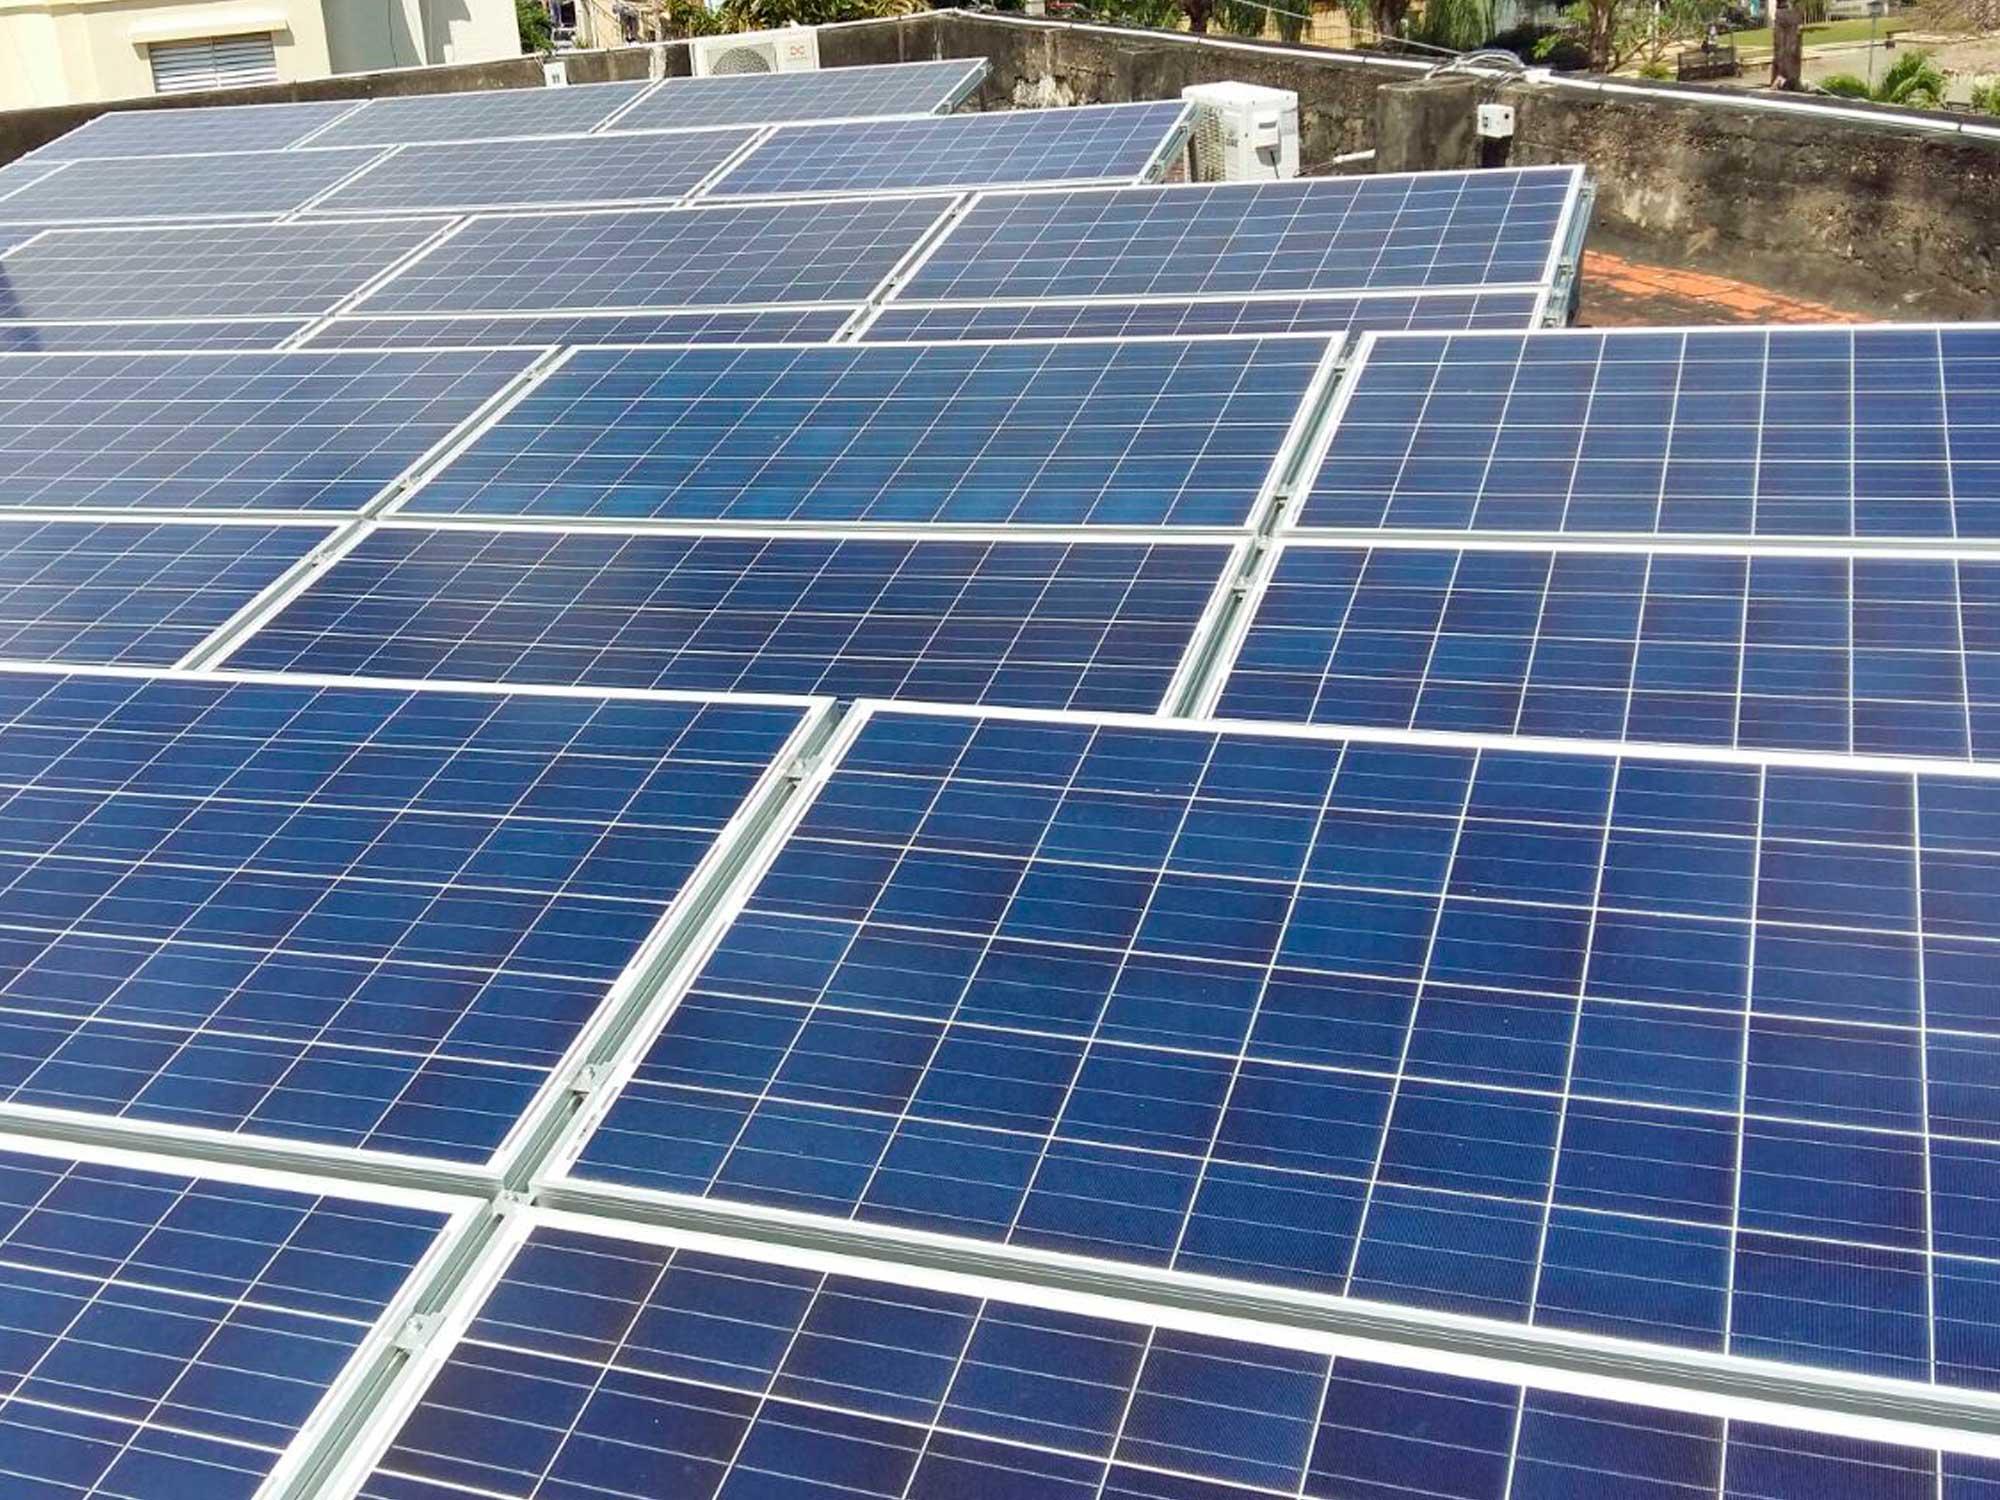 proyecto energia solar fotovoltaica